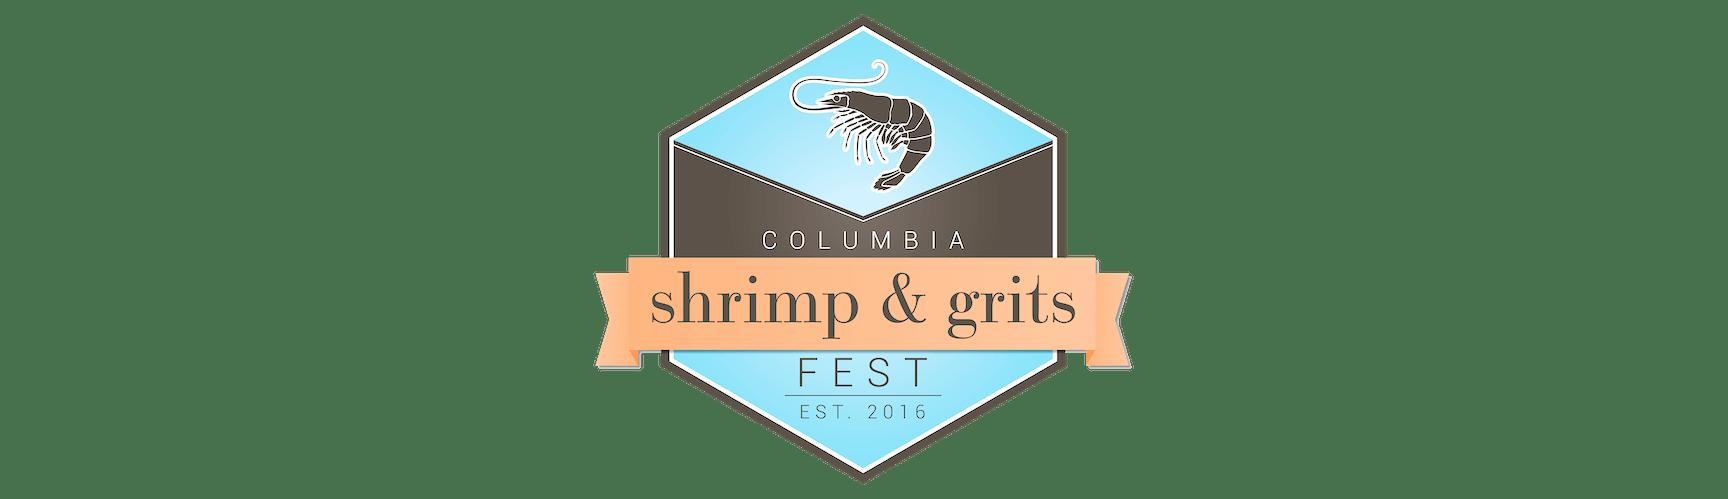 Columbia's Shrimp & Grits Fest Logo